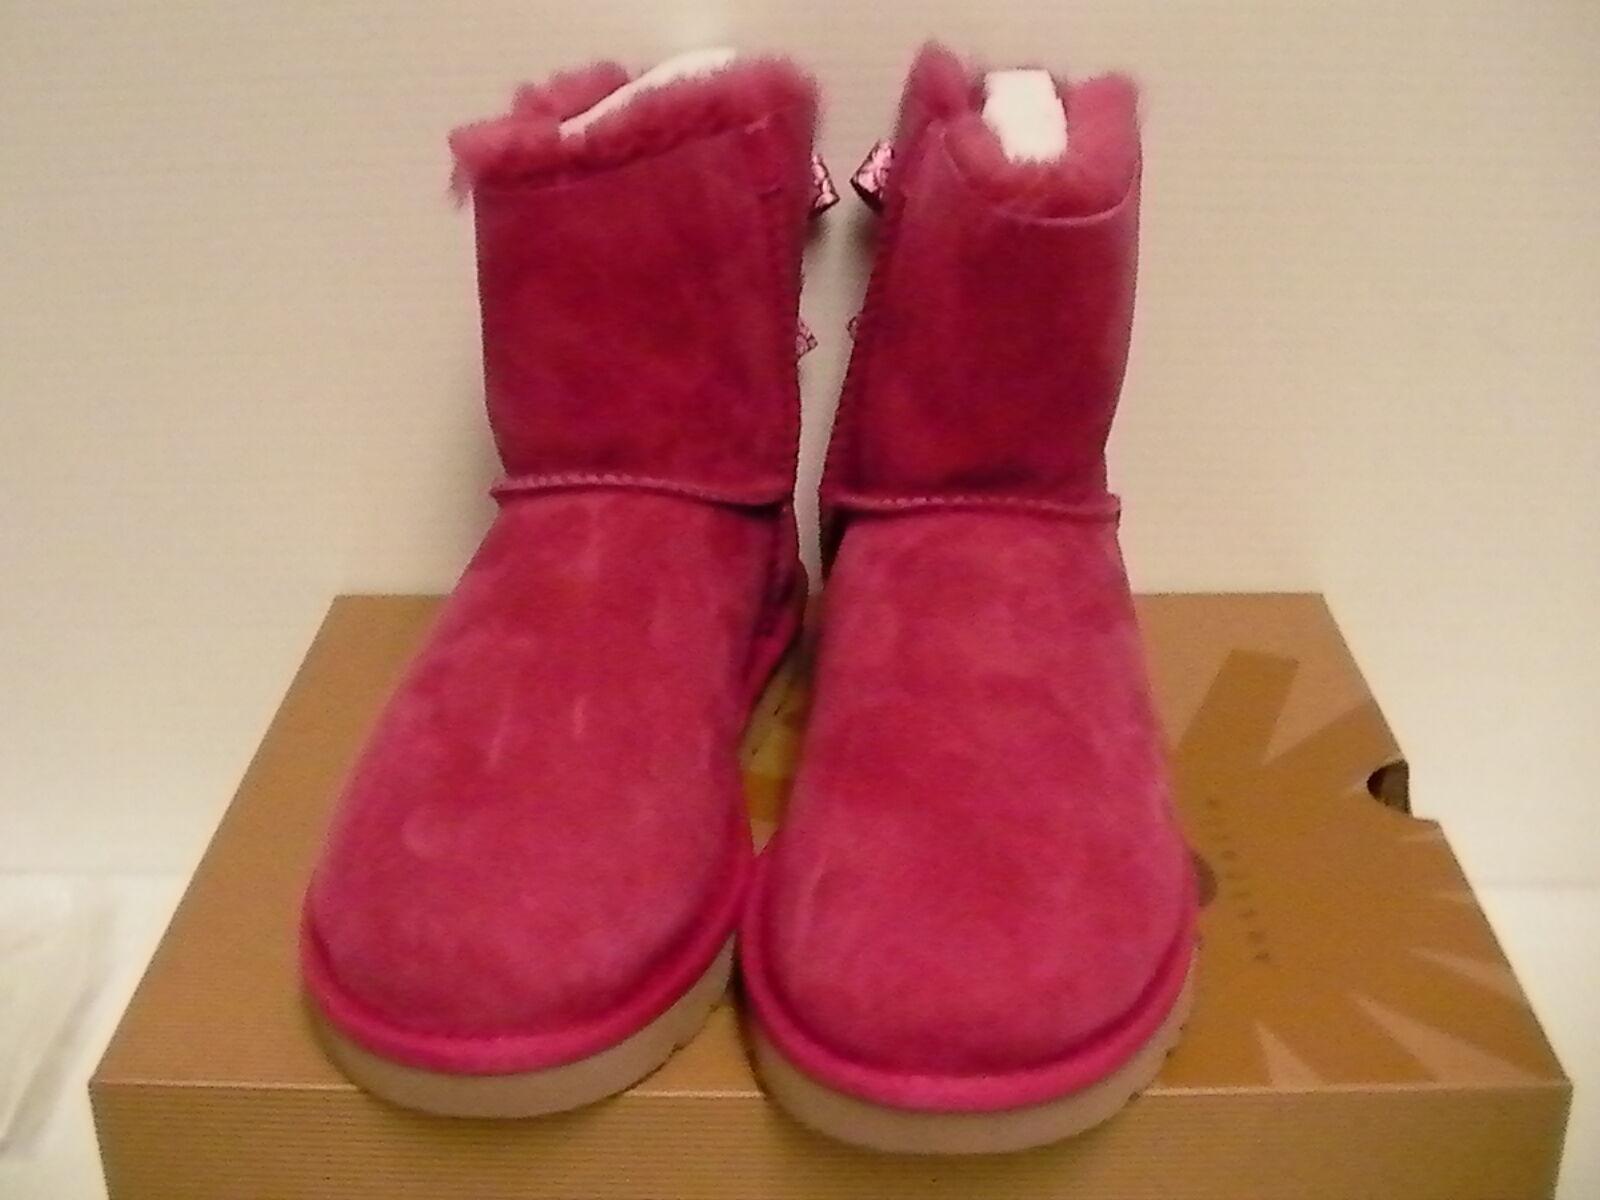 Botas ugg para mujer mini bailey arco vieira piel de oveja rosa tamaño 7 us nuevo con caja